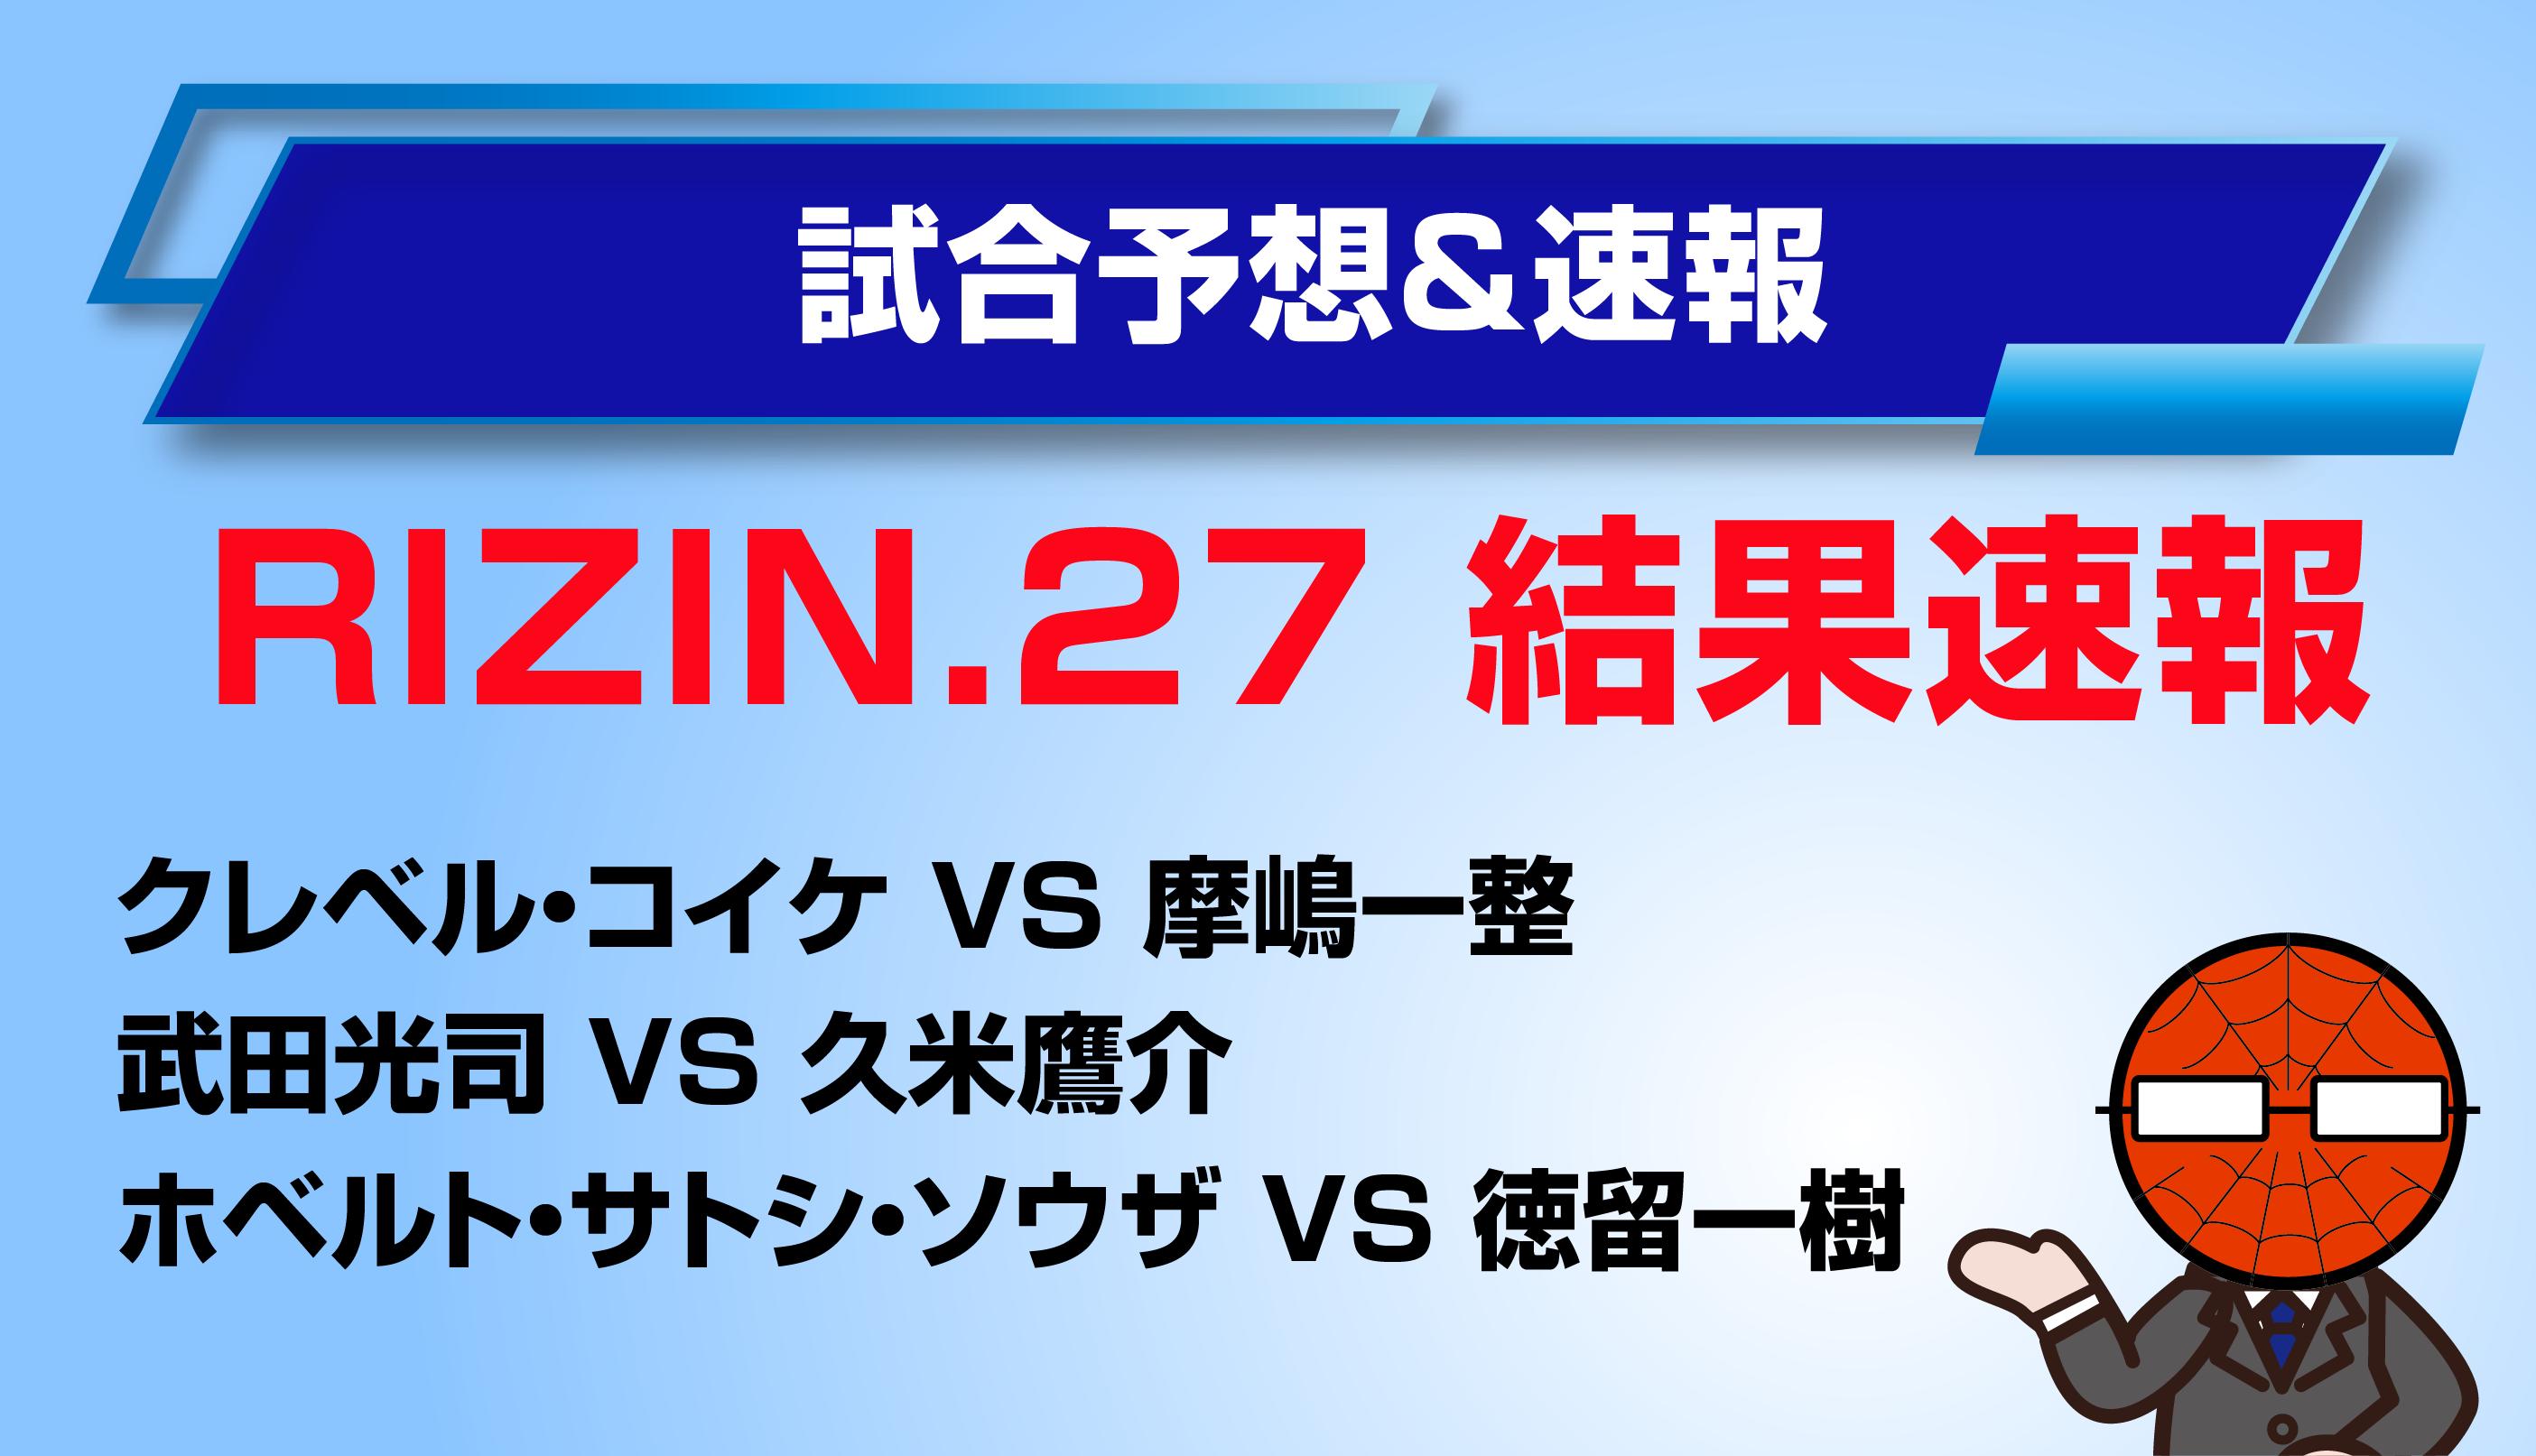 rizin-27-news